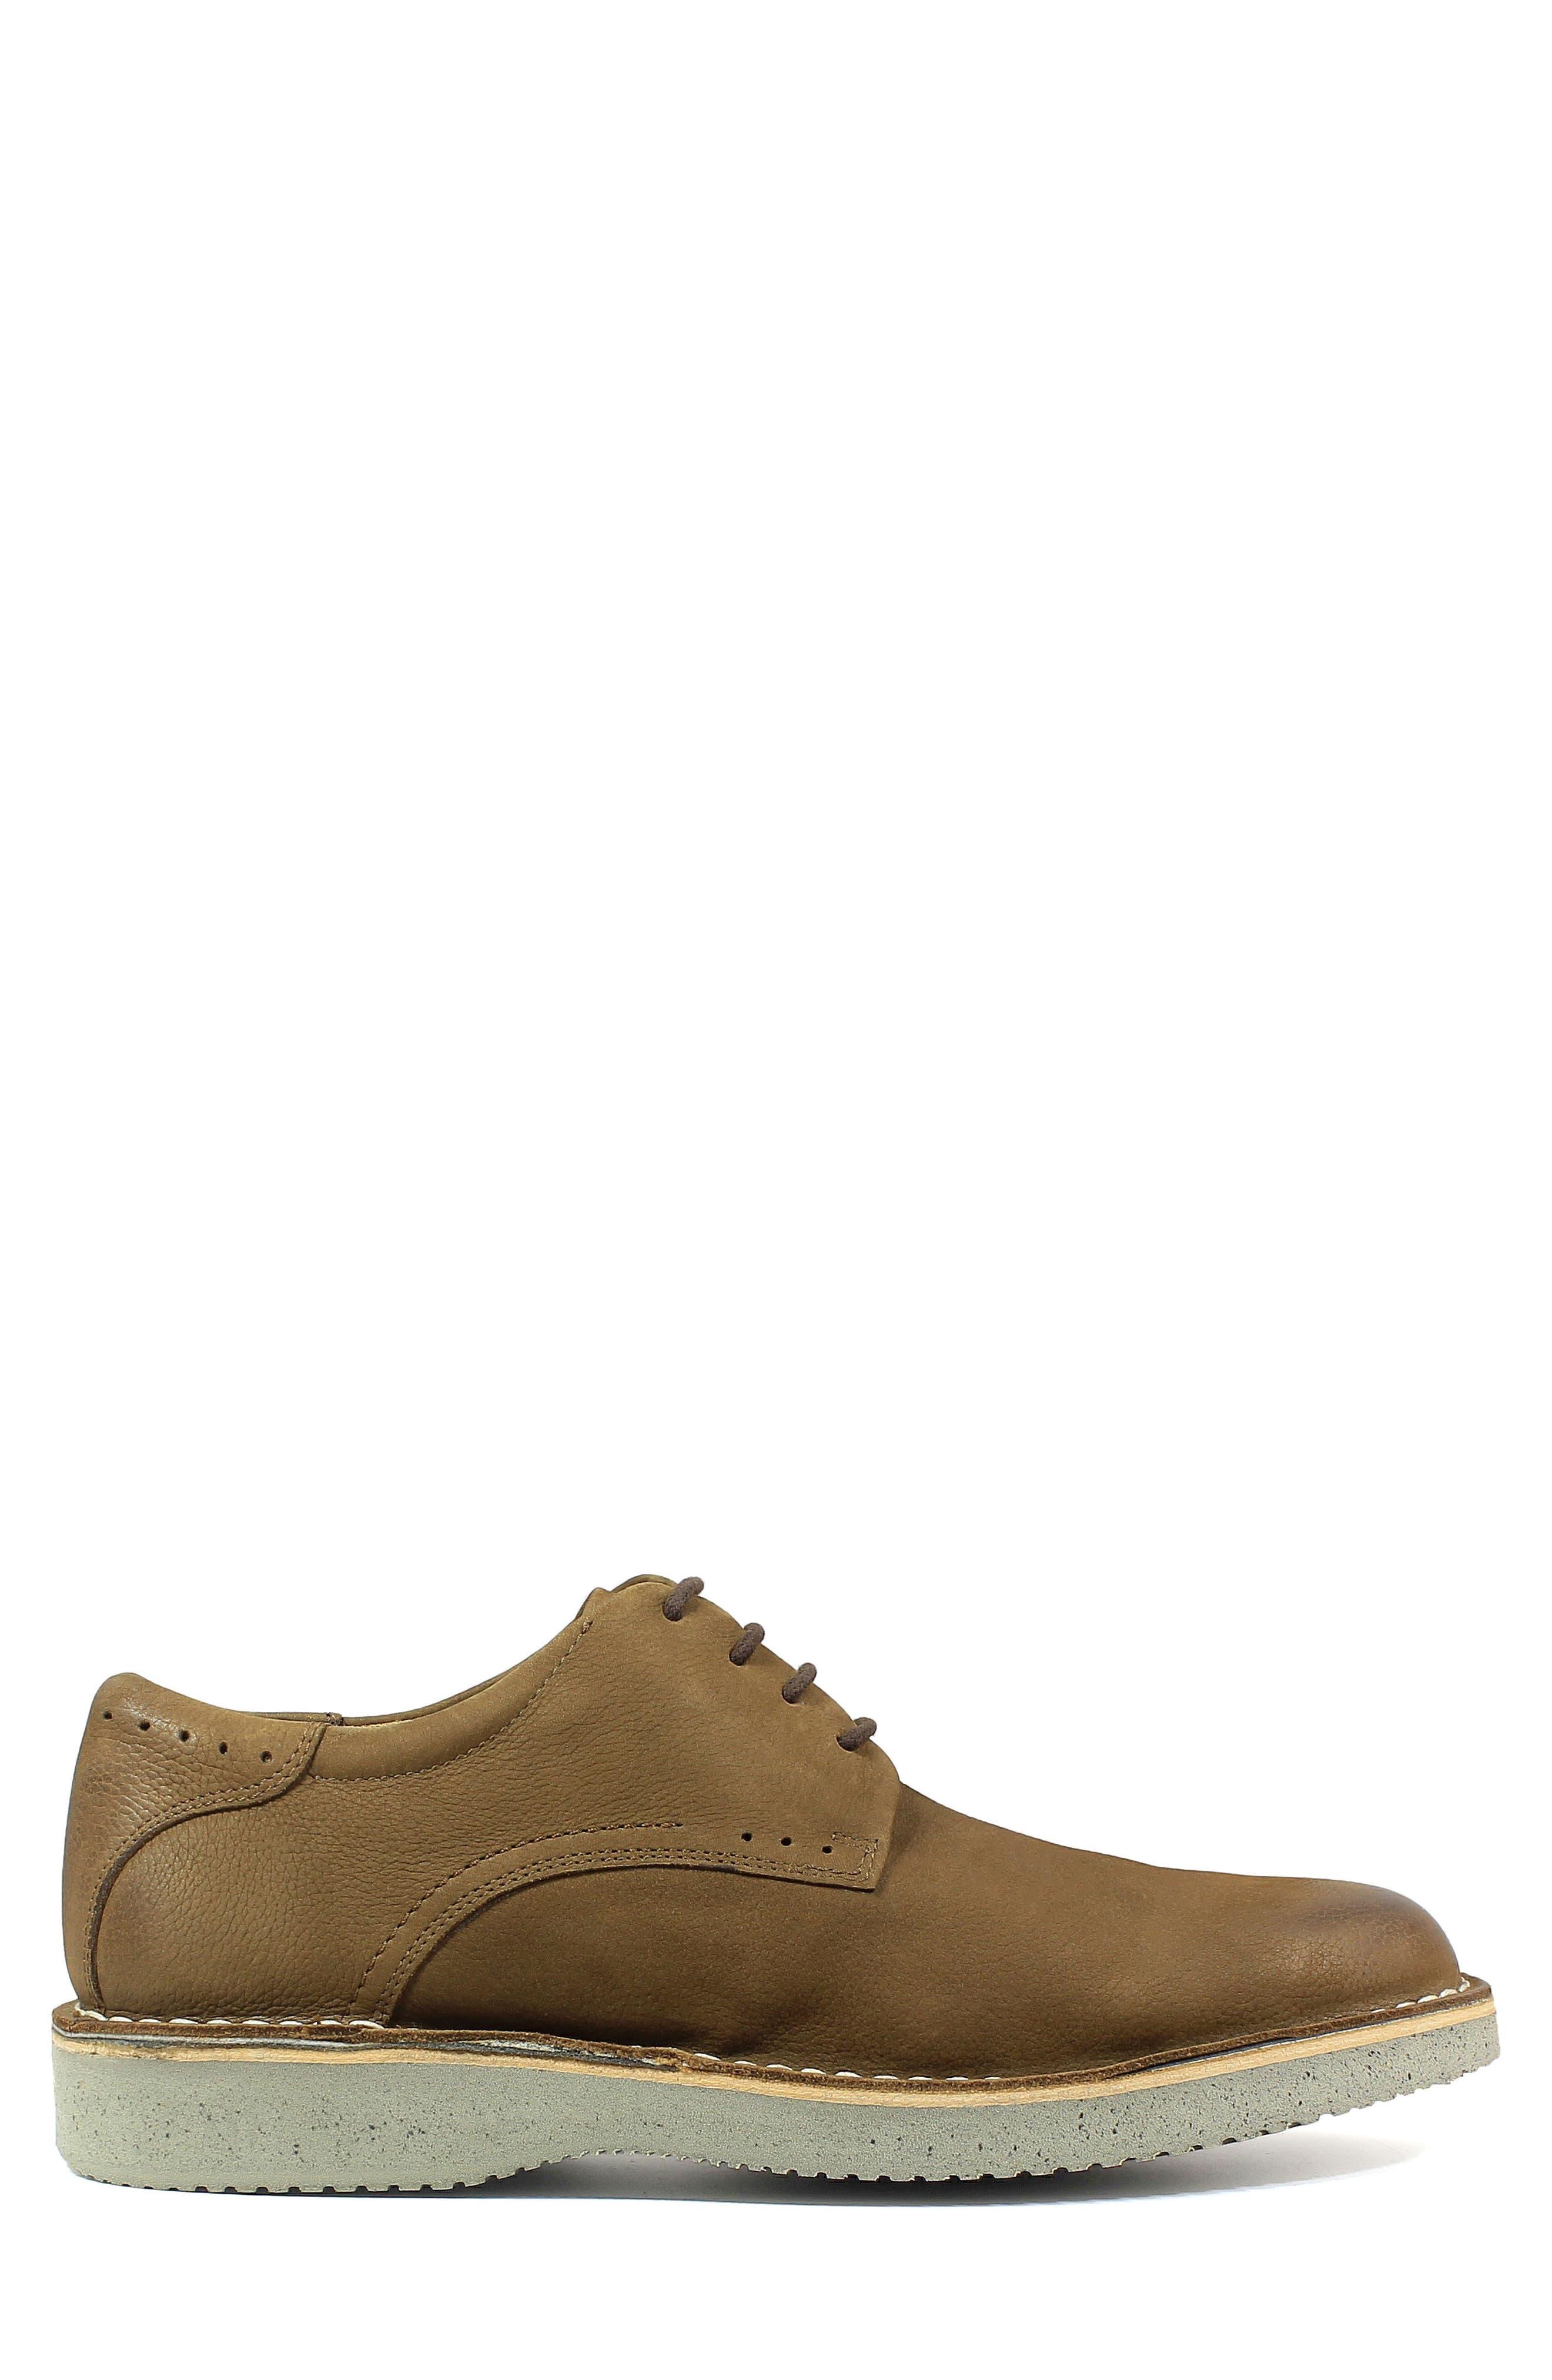 Navigator Plain Toe Oxford,                             Alternate thumbnail 3, color,                             Cocoa Nubuck Leather